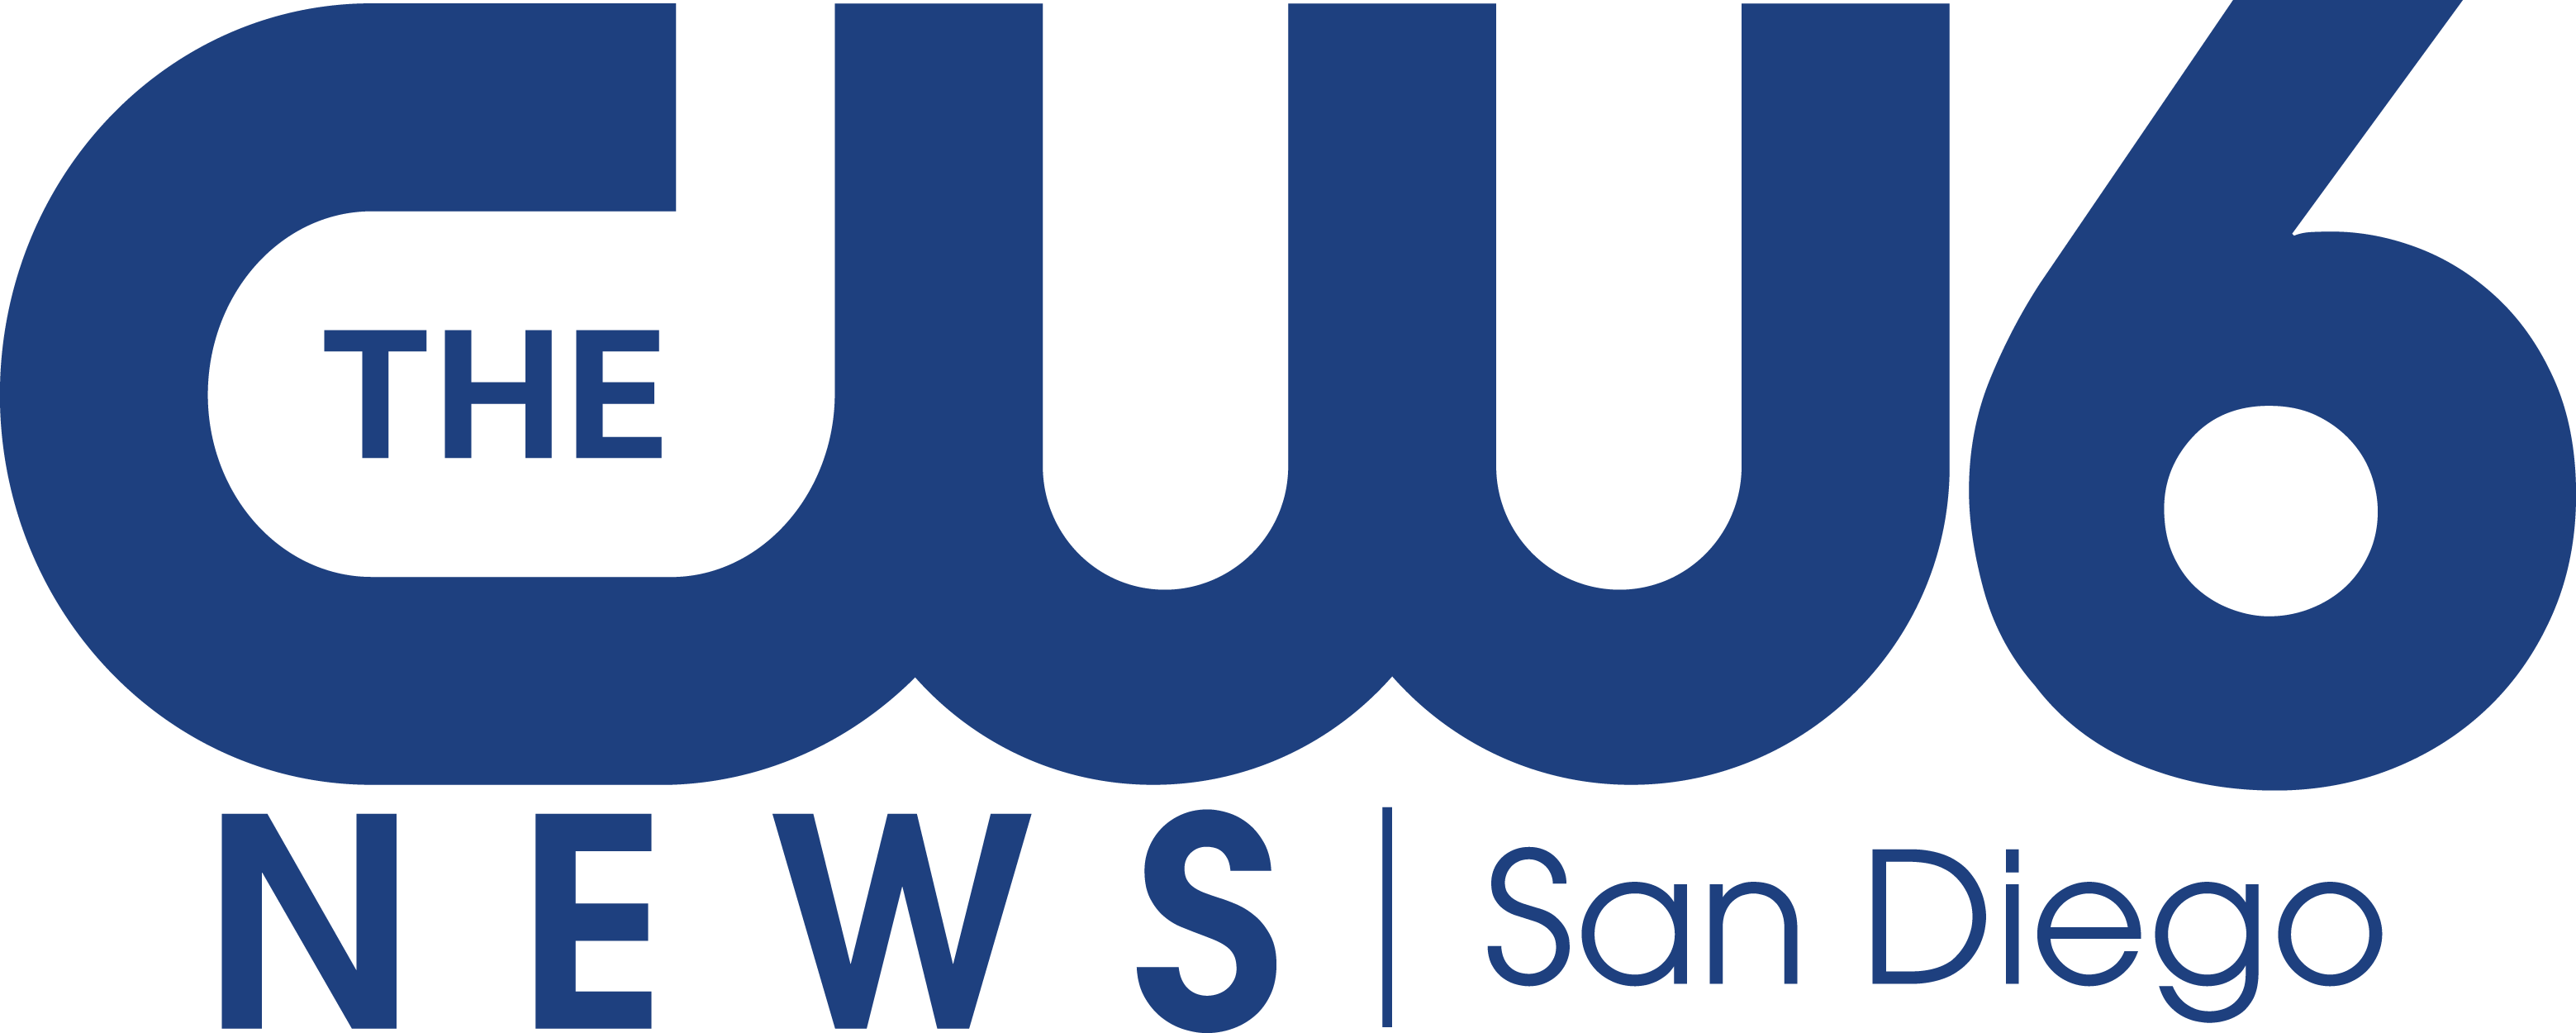 File:CW 6 News logo 2016.png.